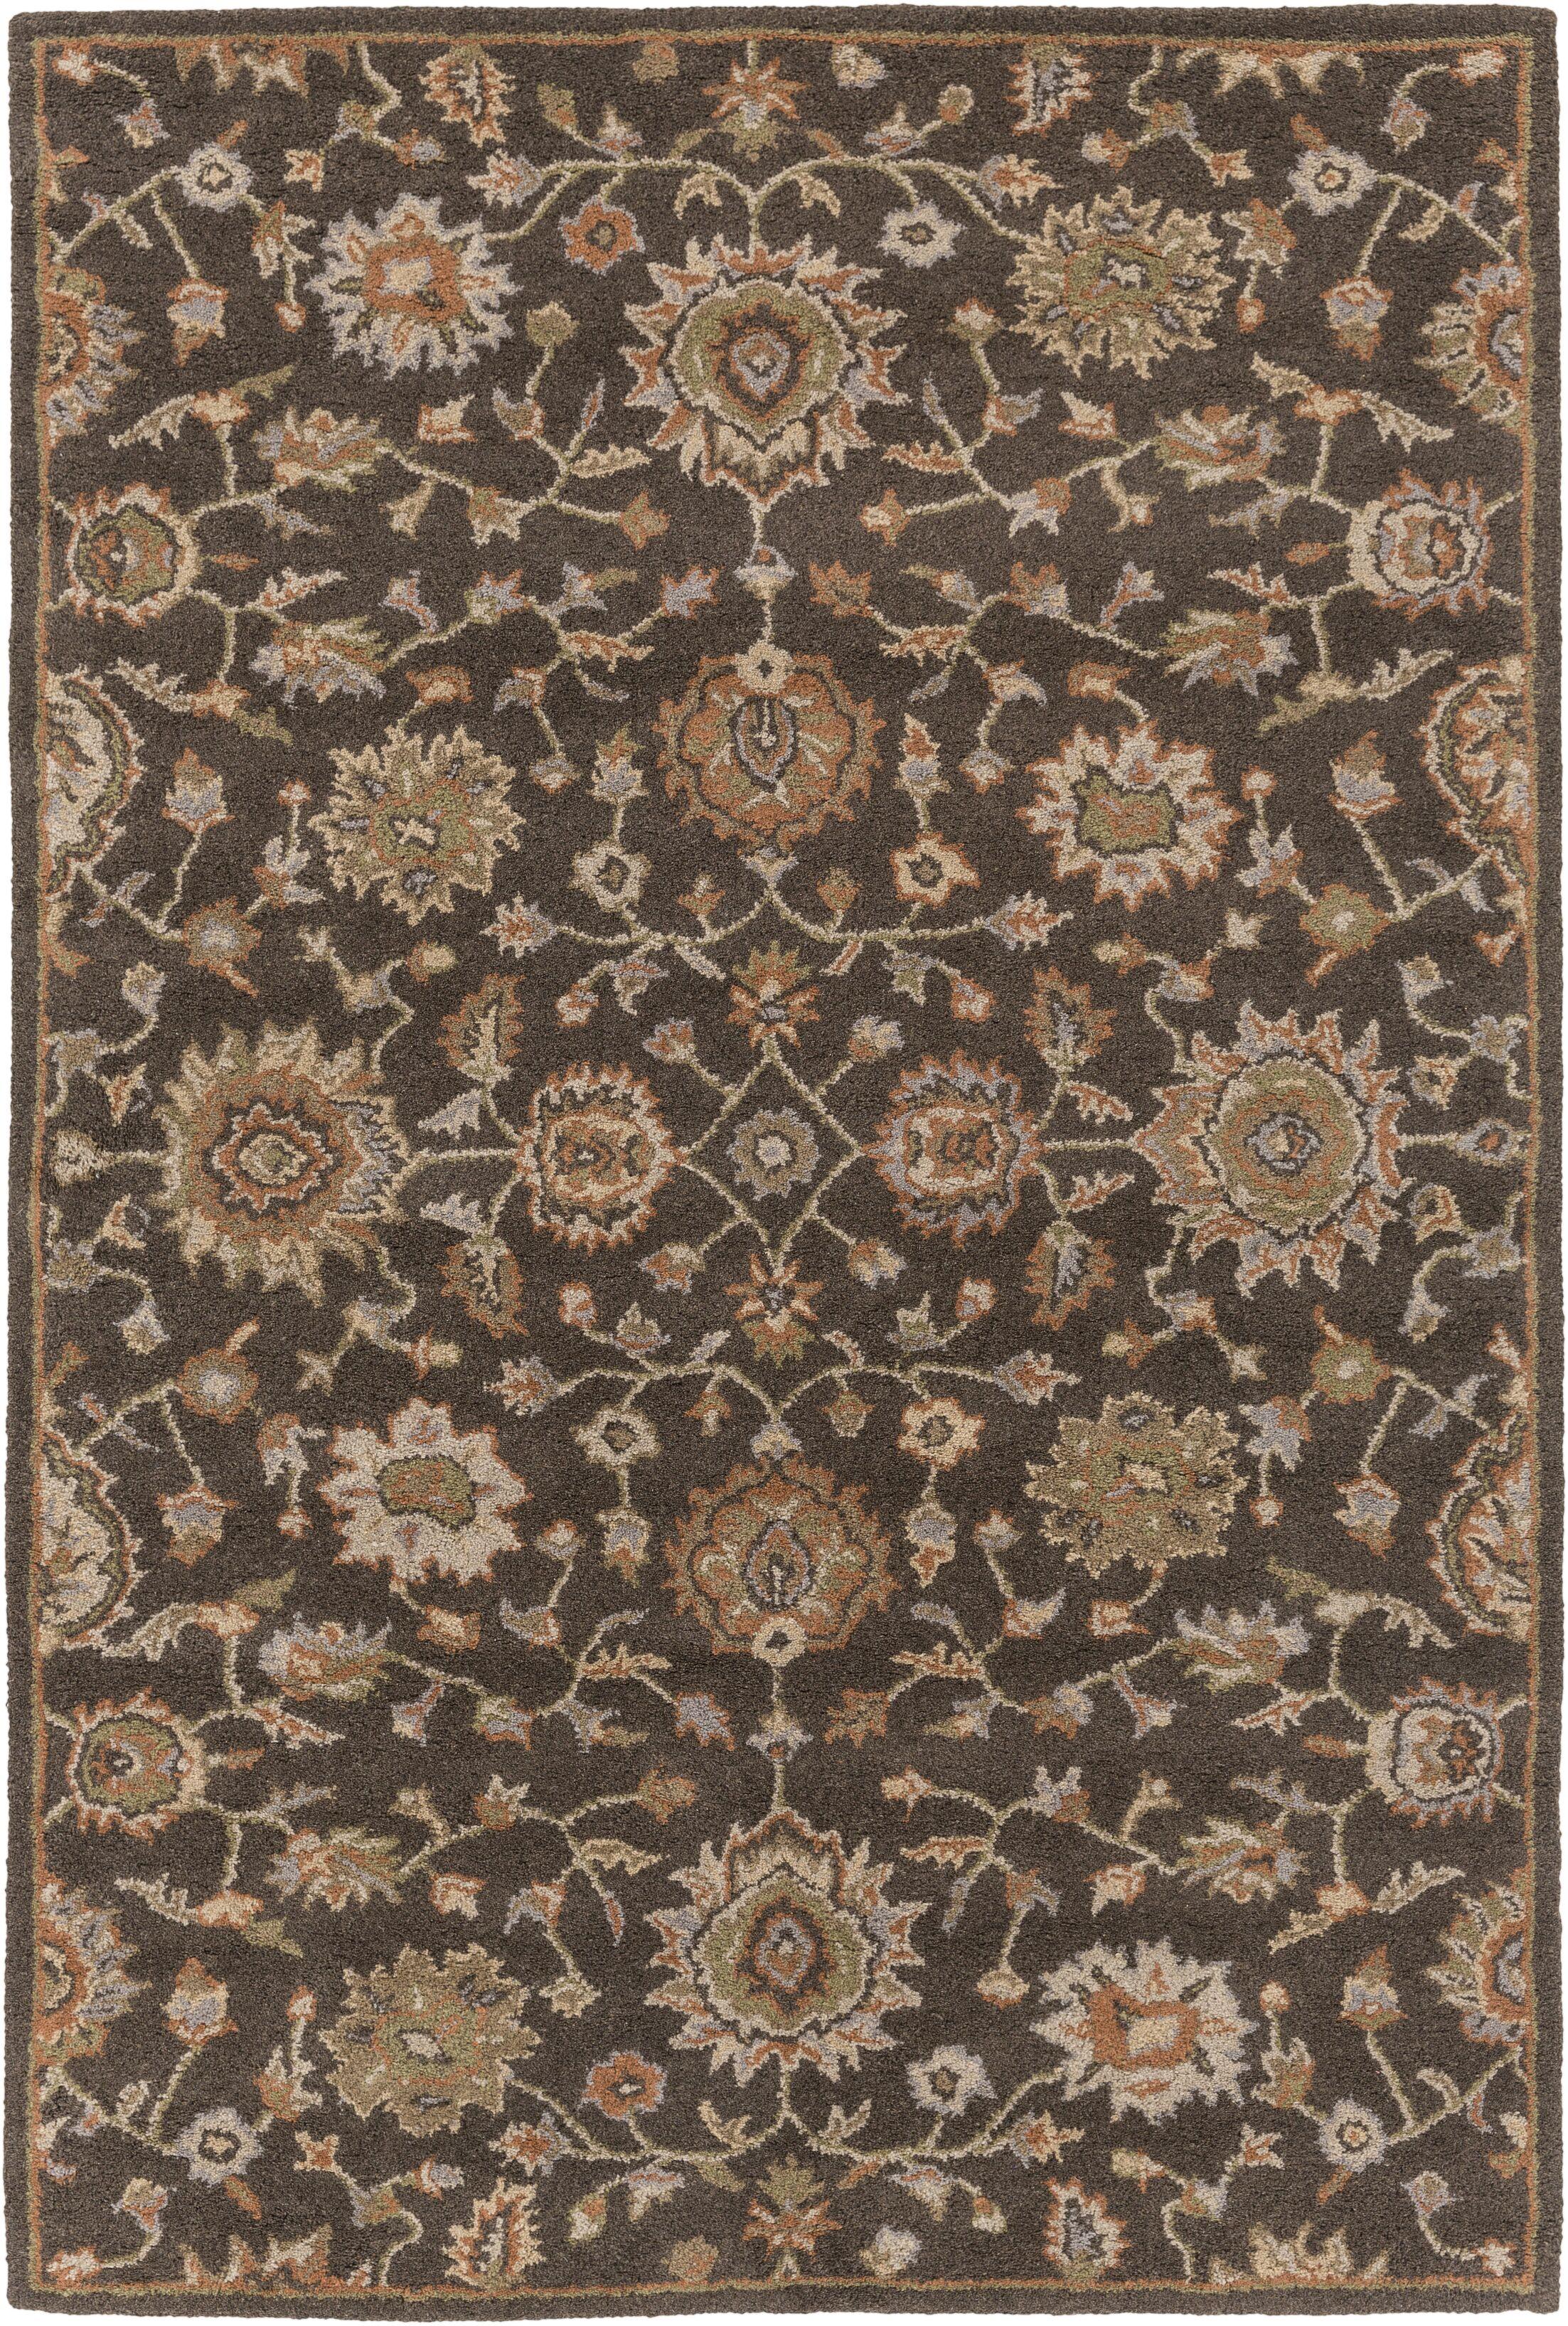 Dyal Brown Area Rug Rug Size: Rectangle 5' x 7'6